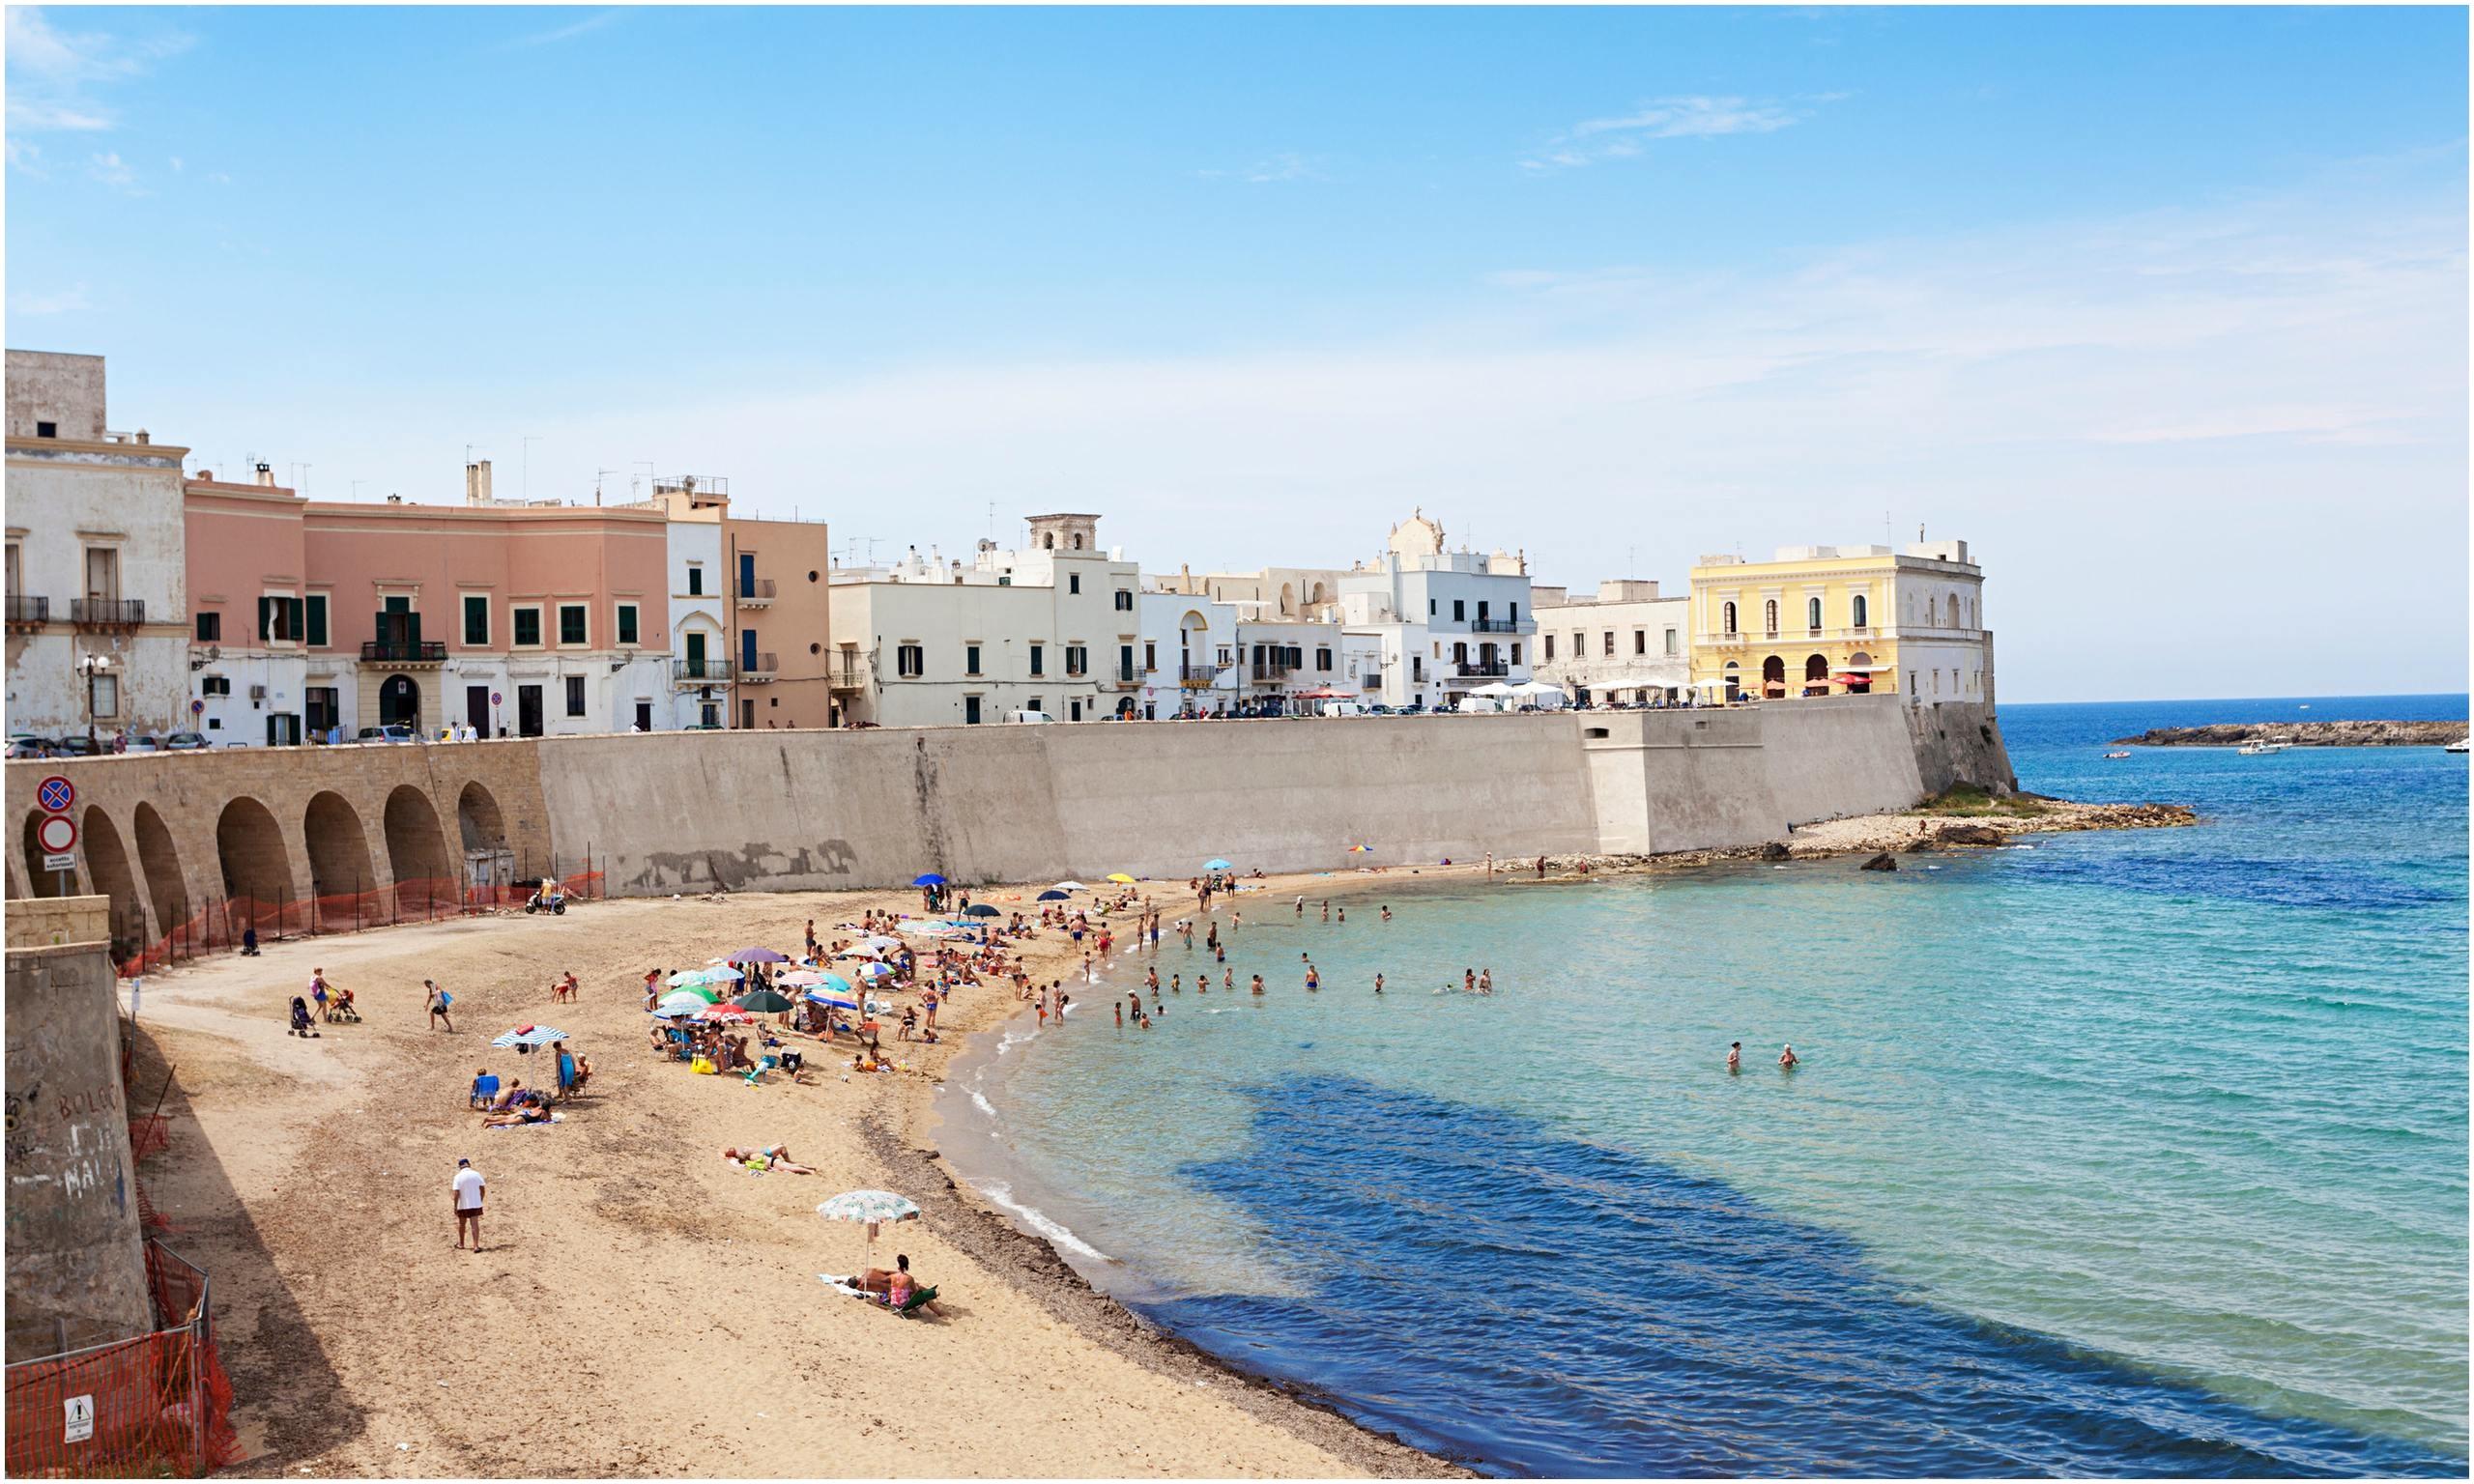 Unspoilt Italy fall head over heel for Puglia s Salento region Wild beaches